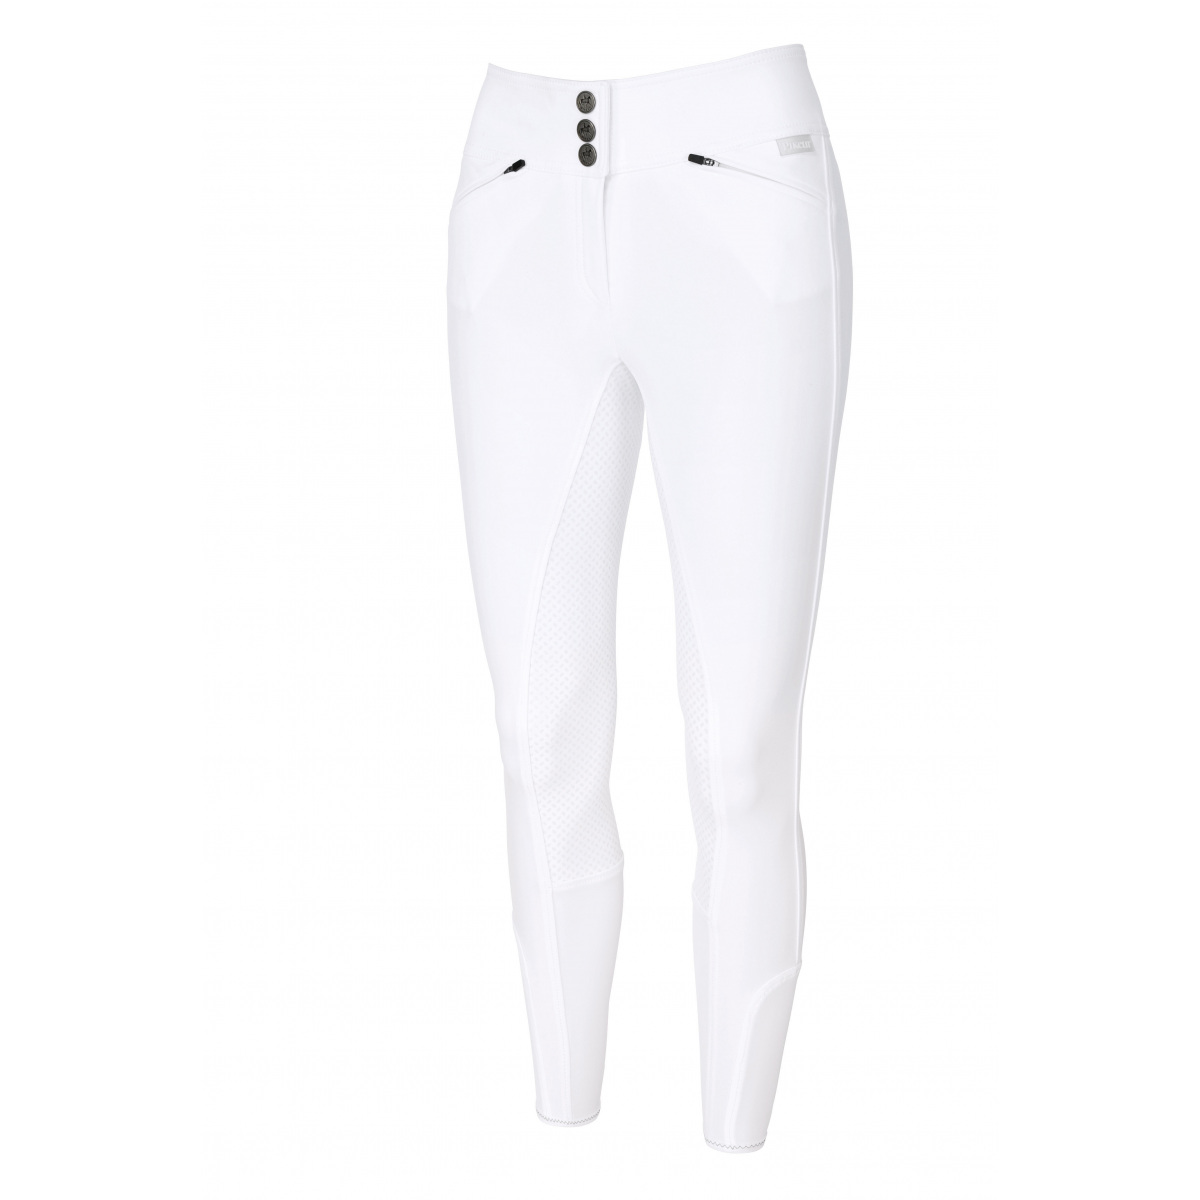 ◆ SALE!◆ Pikeur LEFINIA GRIP (レディース フルグリップキュロット) ホワイト/38